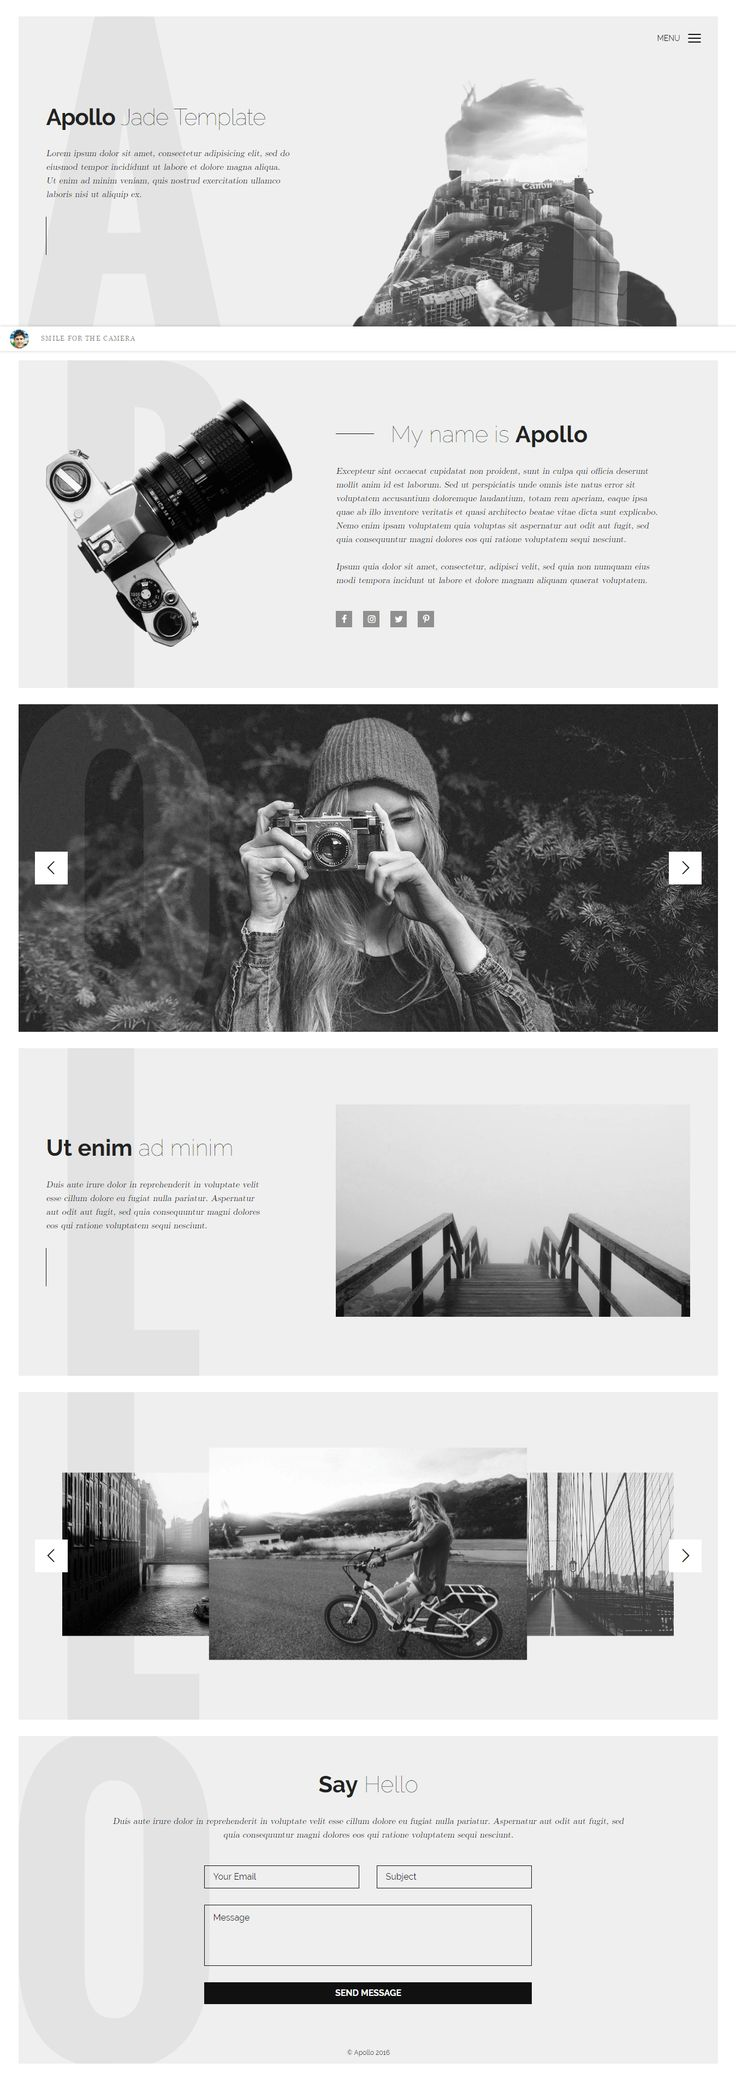 HTML template for photographers – Apollo. #download #free #html #template #apollo #freebiesteam #webresources #codestuff #css3